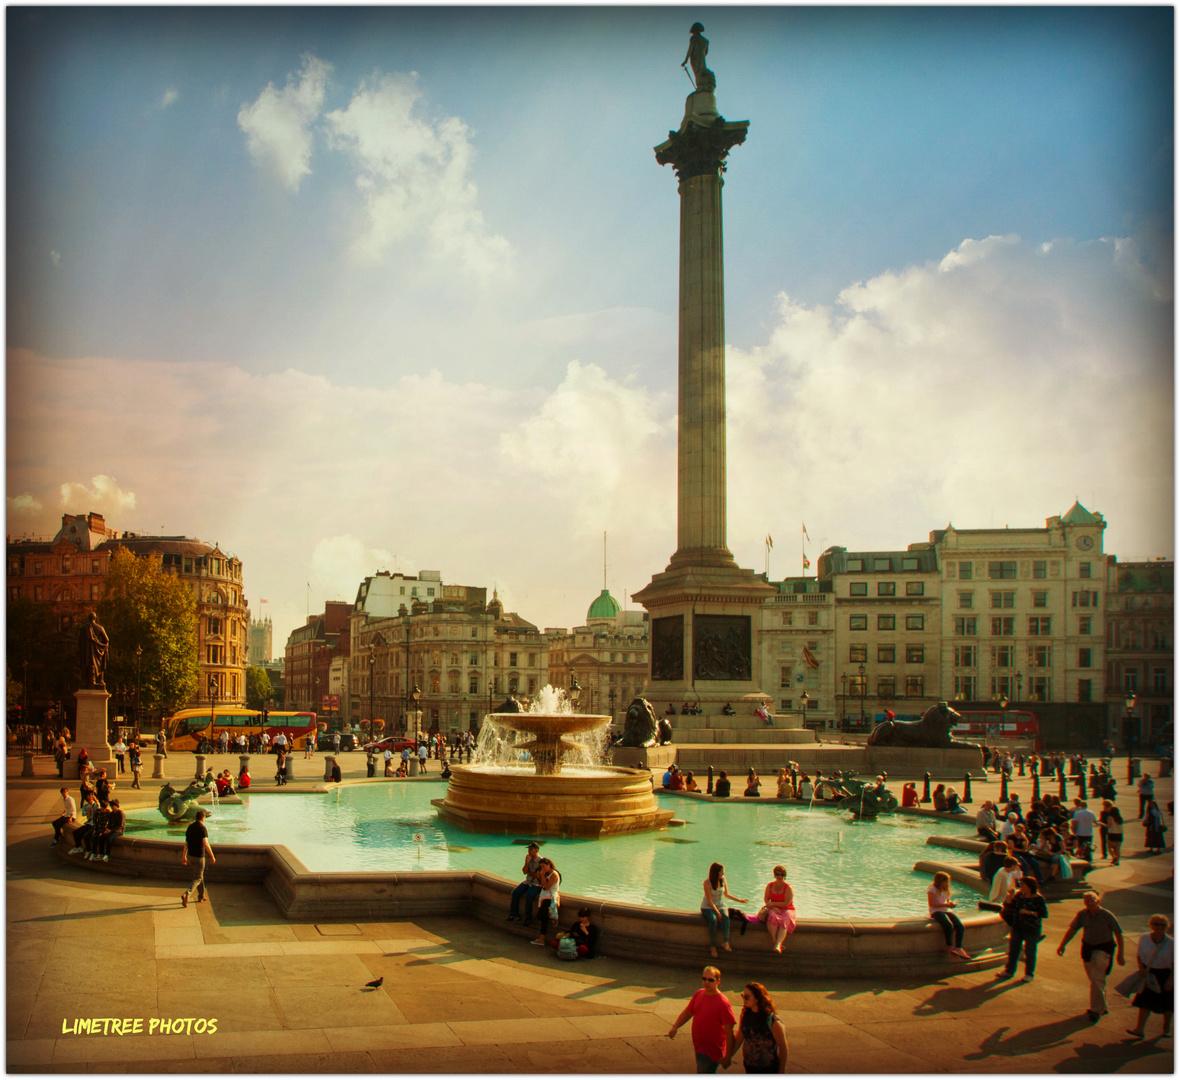 Nelson on Trafalgar Square